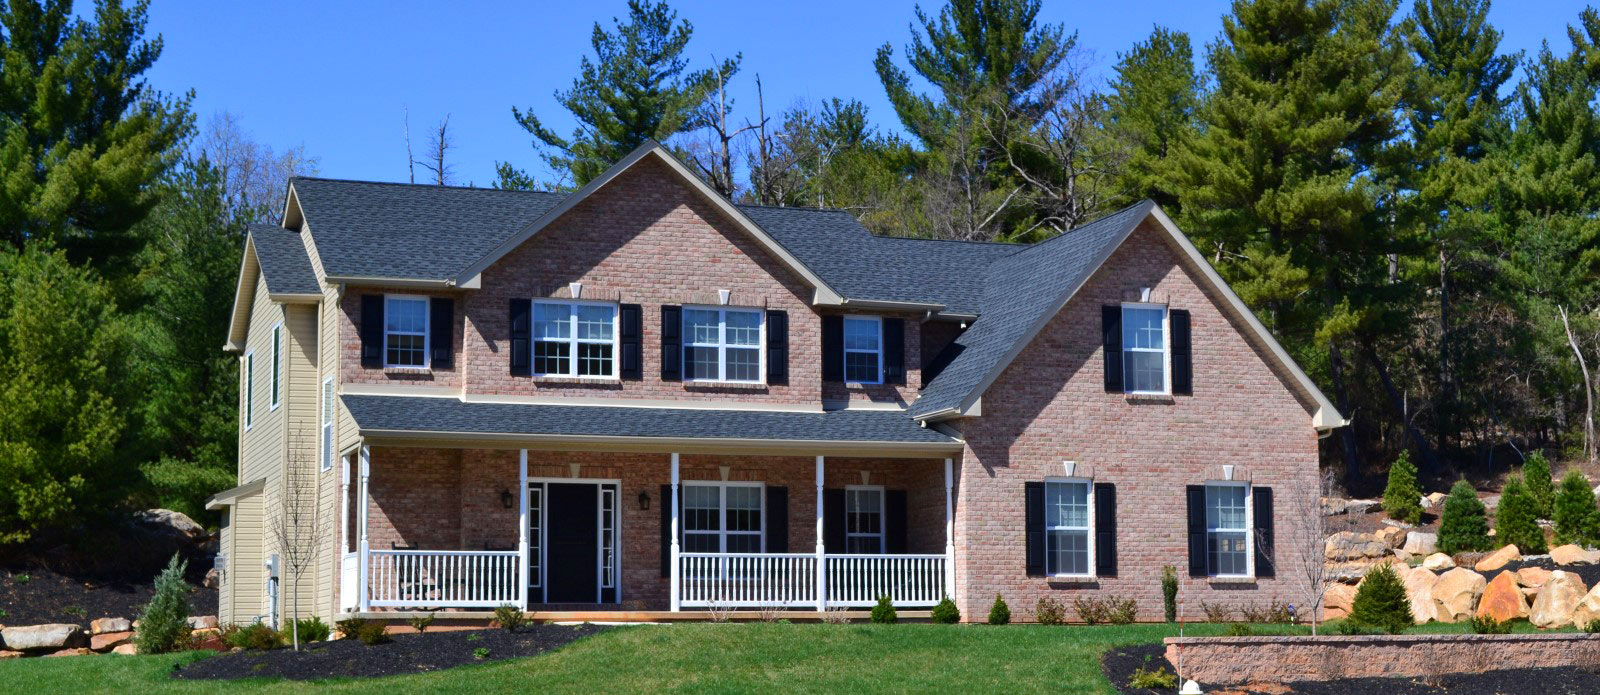 The Joseph Home Model